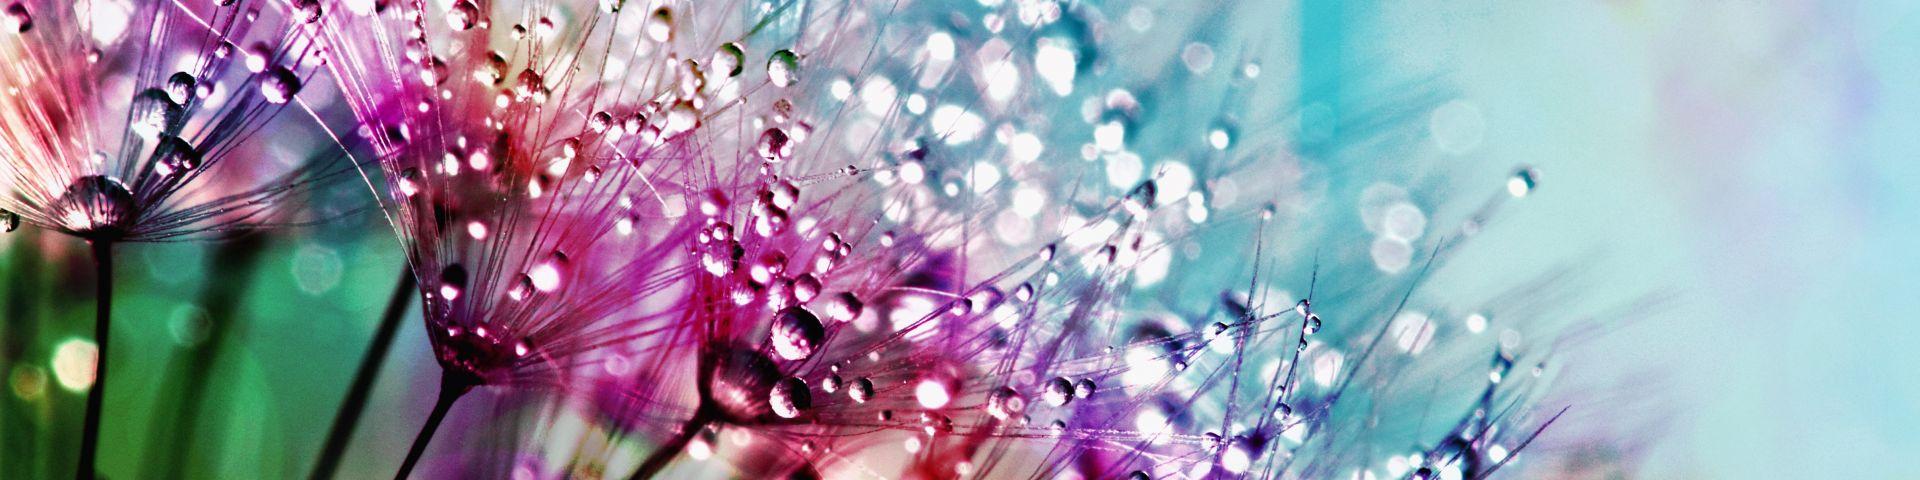 beautiful-blur-blurred-background-794494